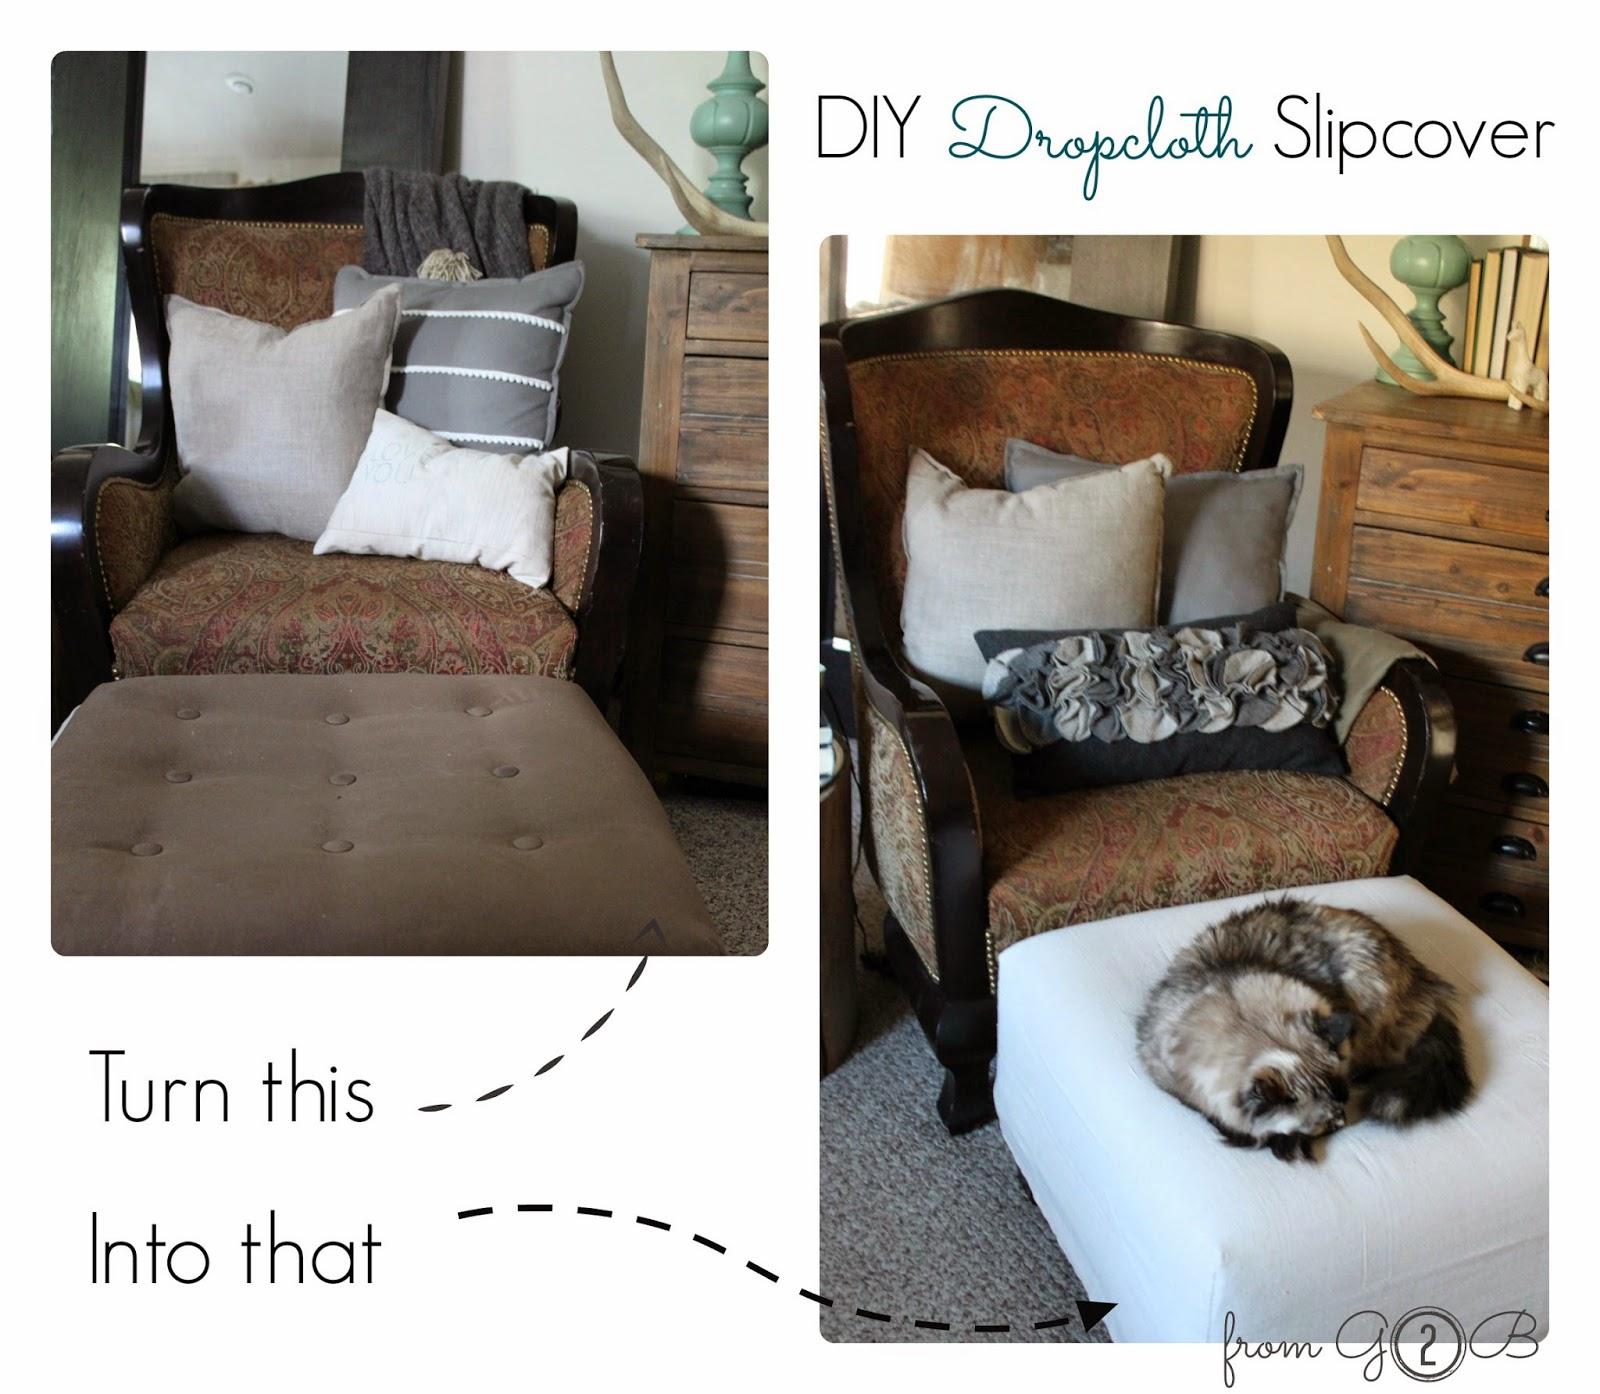 DIY-Dropcloth-Slipcover